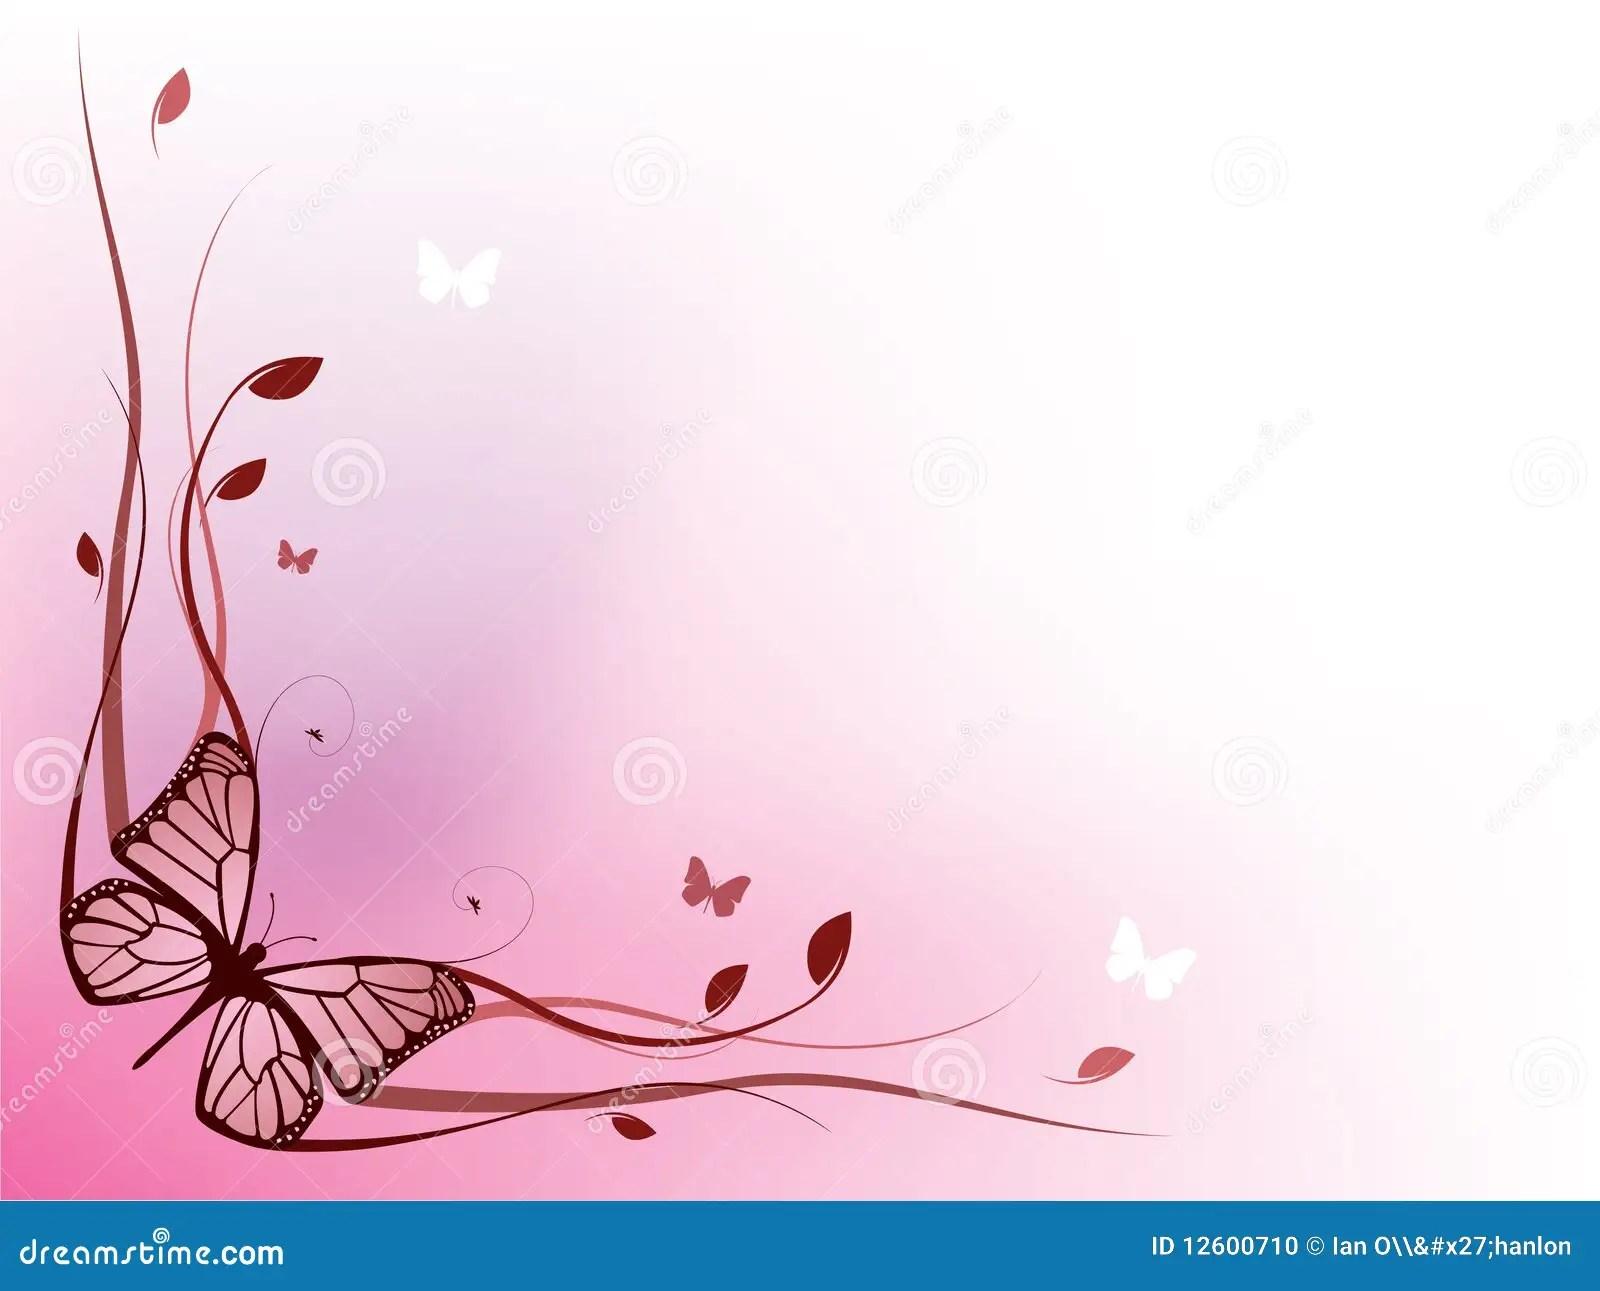 Cute Nail Arts Wallpaper Elegant Floral Border Stock Photo Image 12600710